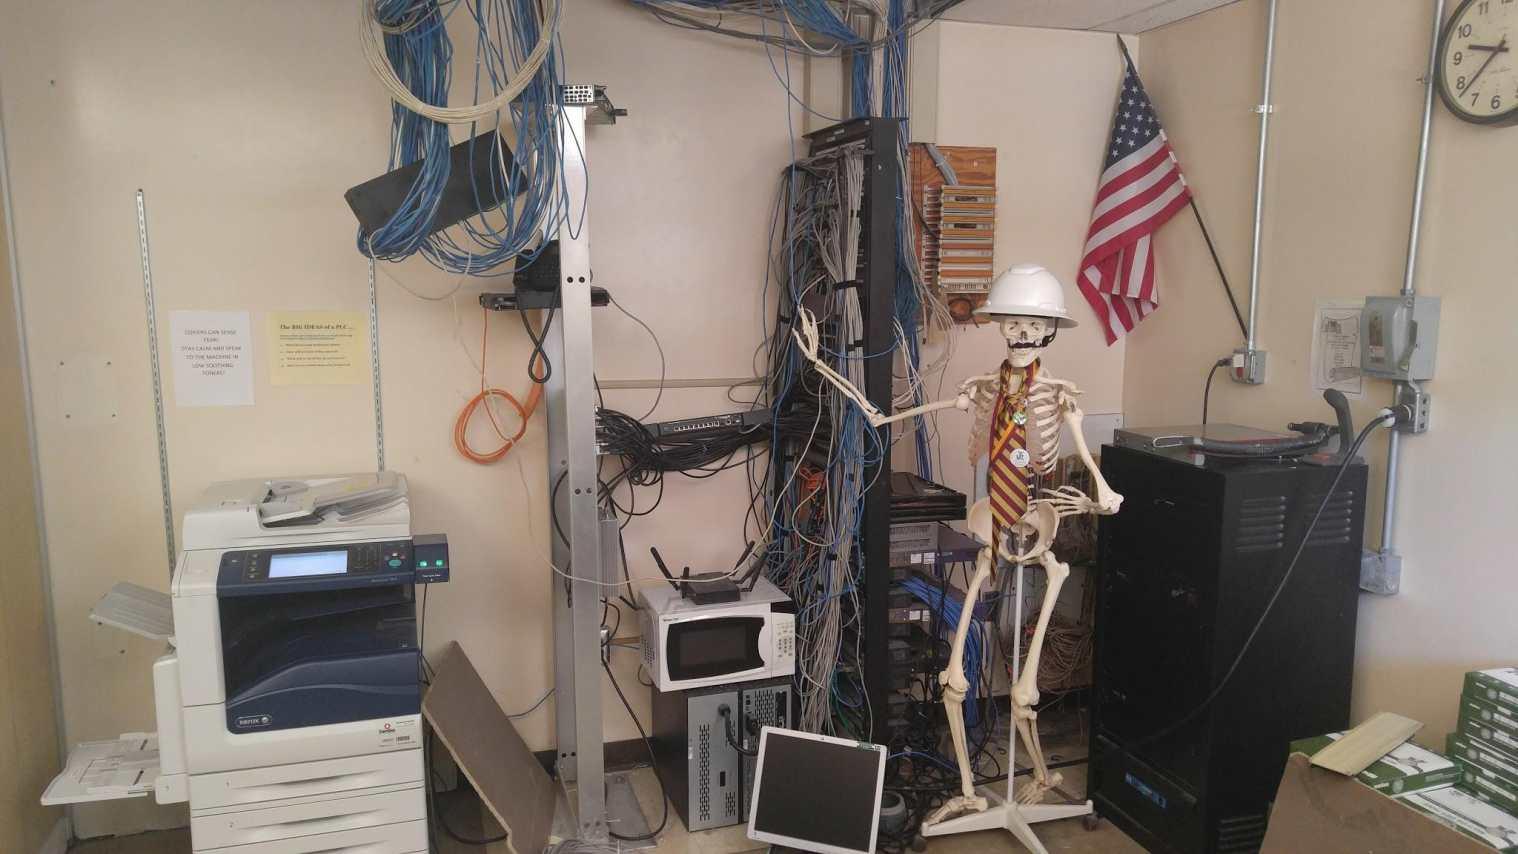 Turpin High School server room